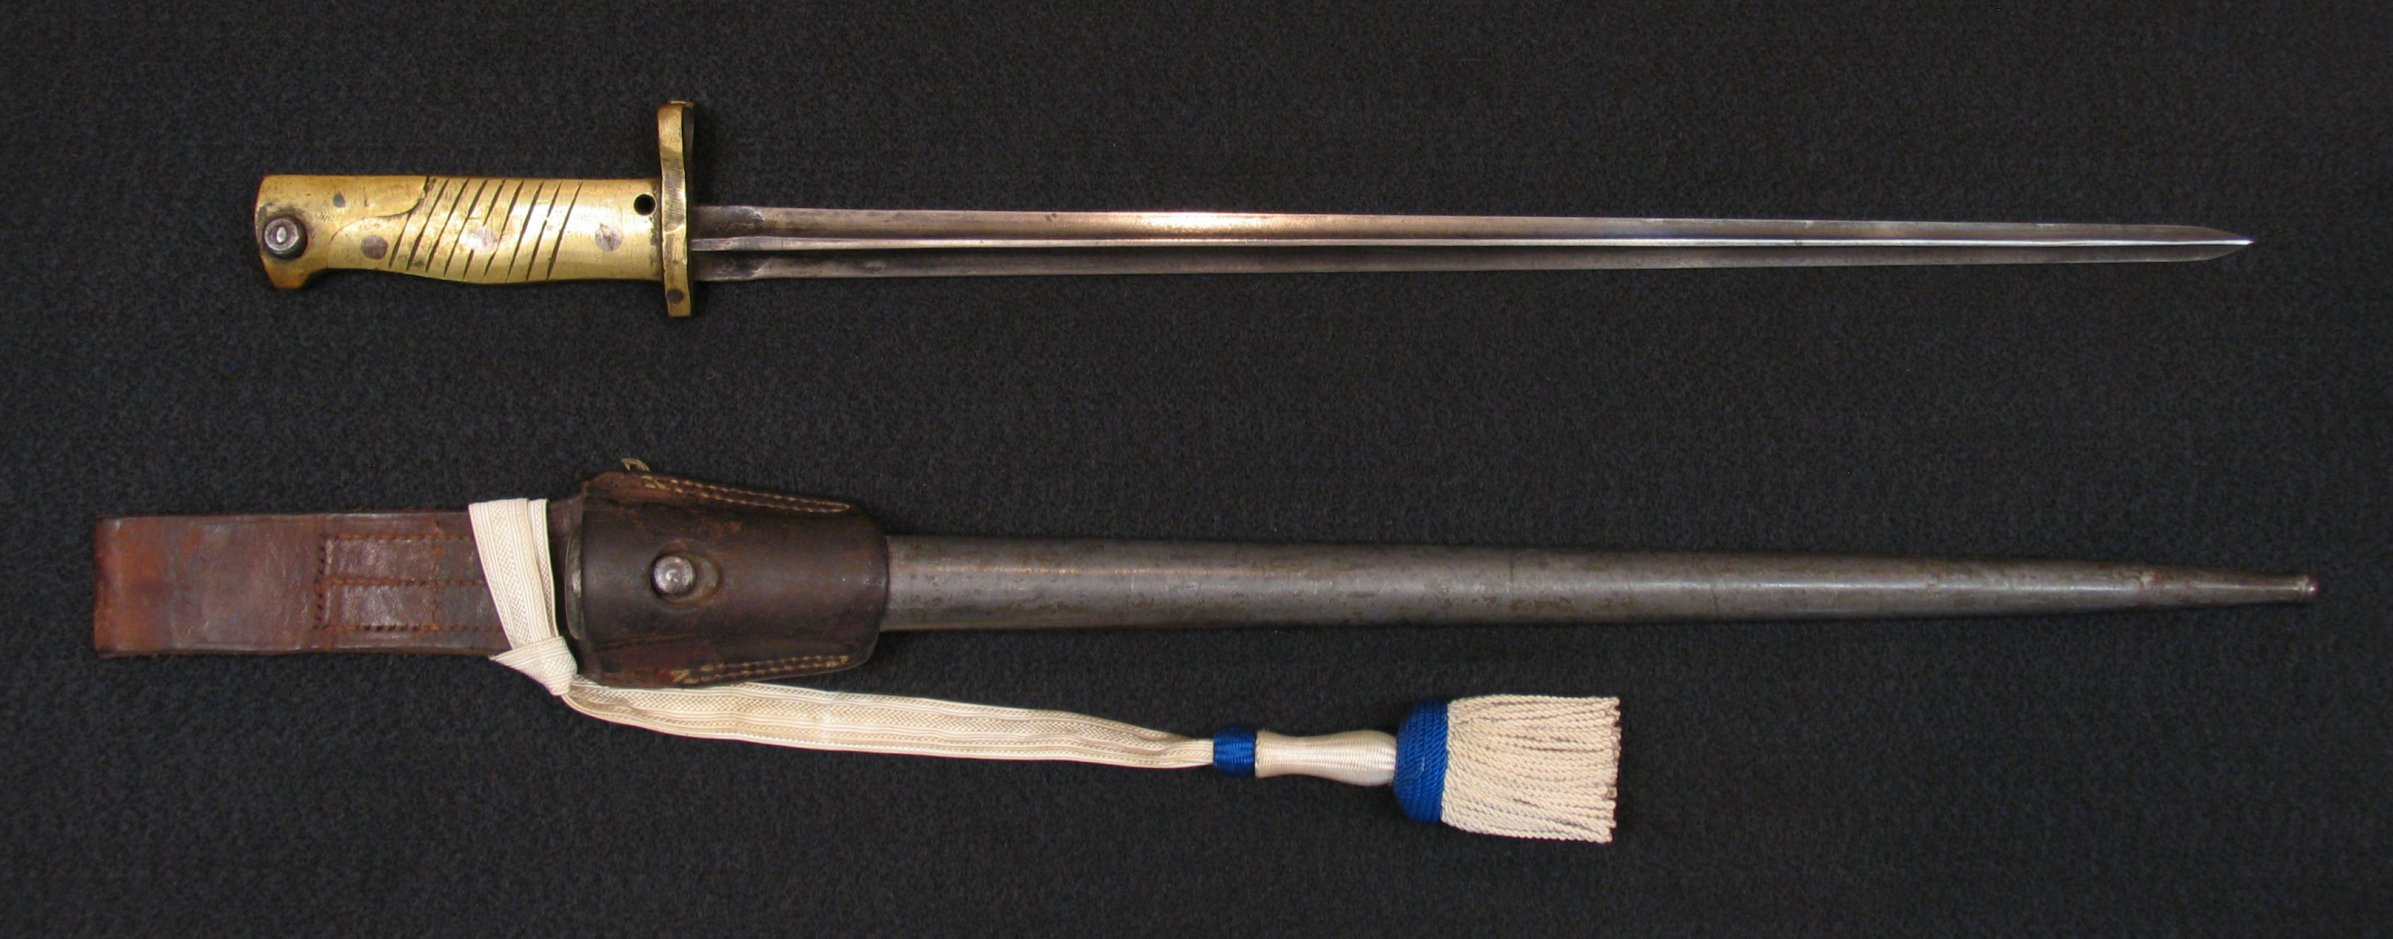 Click image for larger version.  Name:German Ersatz S88-98 w Brass Grip Socket Blade.jpg Views:6 Size:319.9 KB ID:2240498